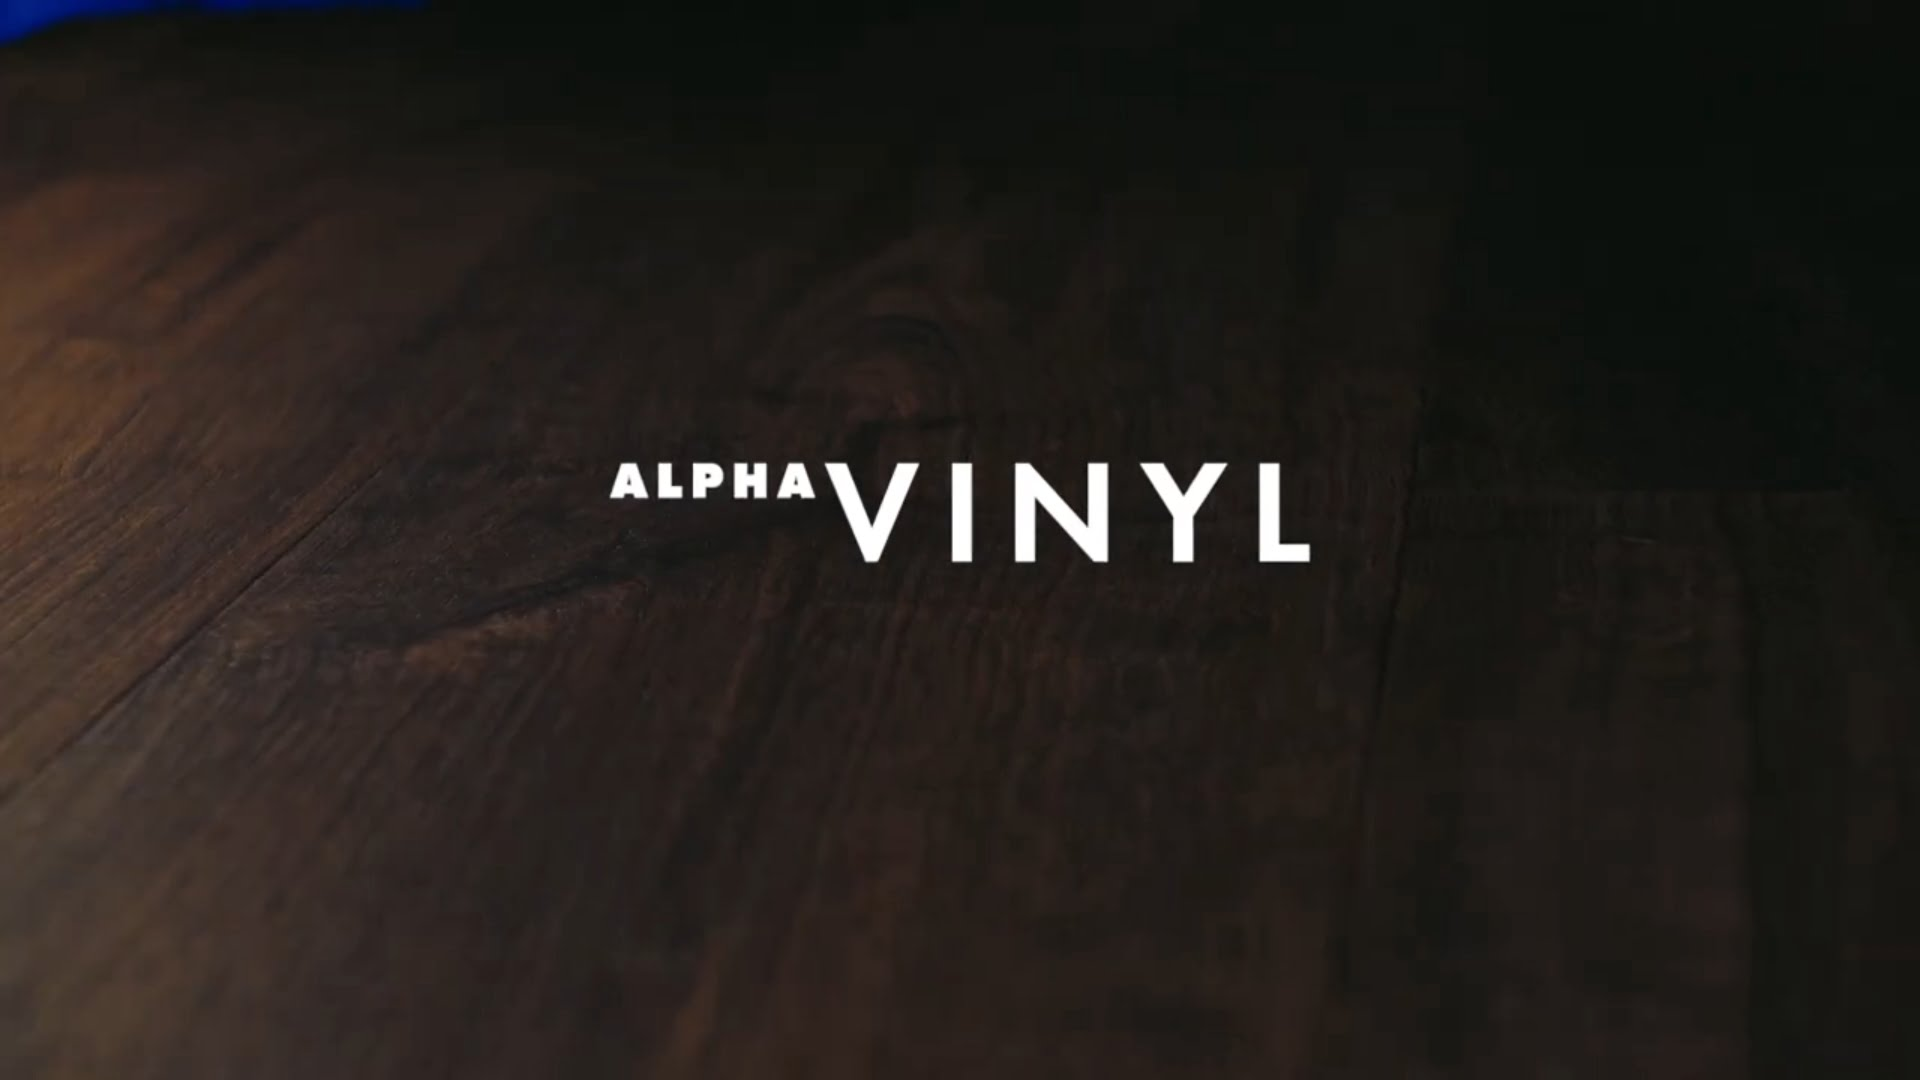 Wszechstronne podłogi winylowe Quick Step Alpha Vinyl.